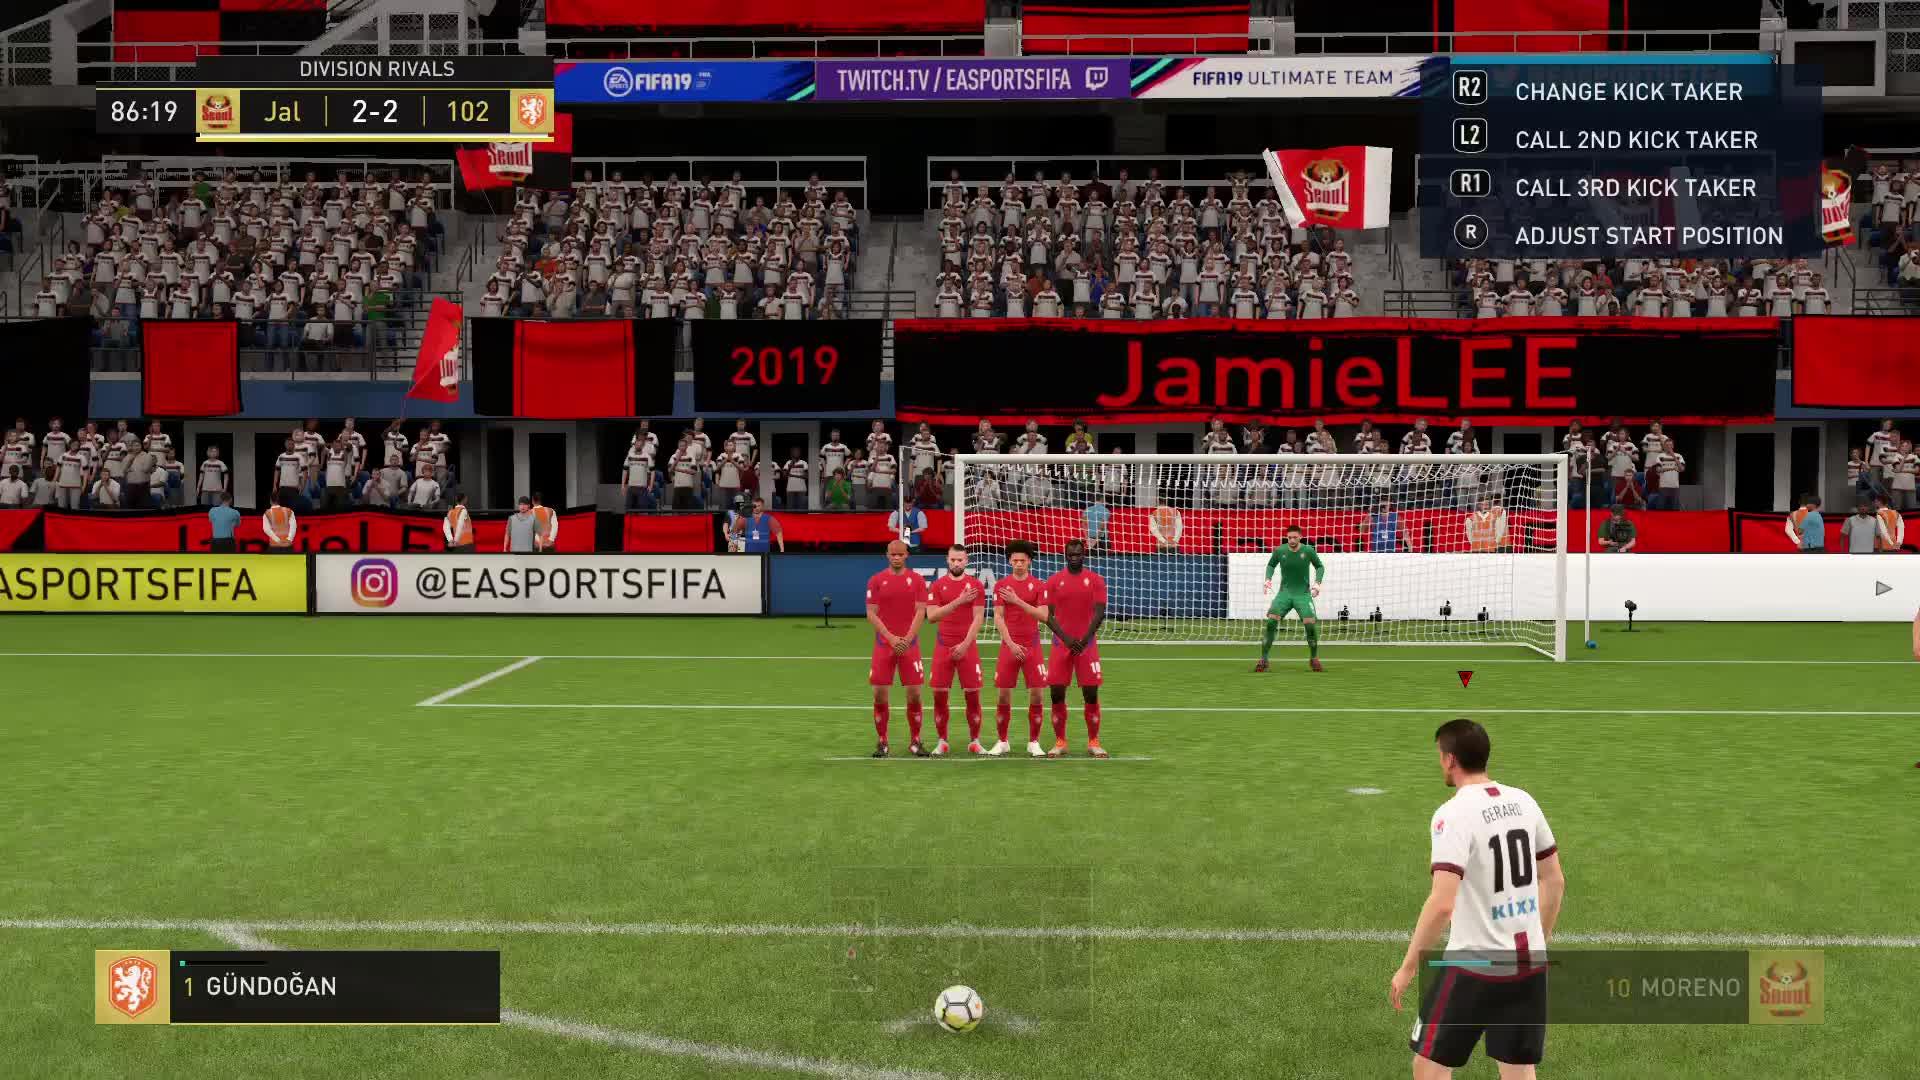 #PS4share, FIFA 19, Gaming, Jamie LEE, PlayStation 4, Sony Interactive Entertainment, FIFA 19_20190207170408 GIFs